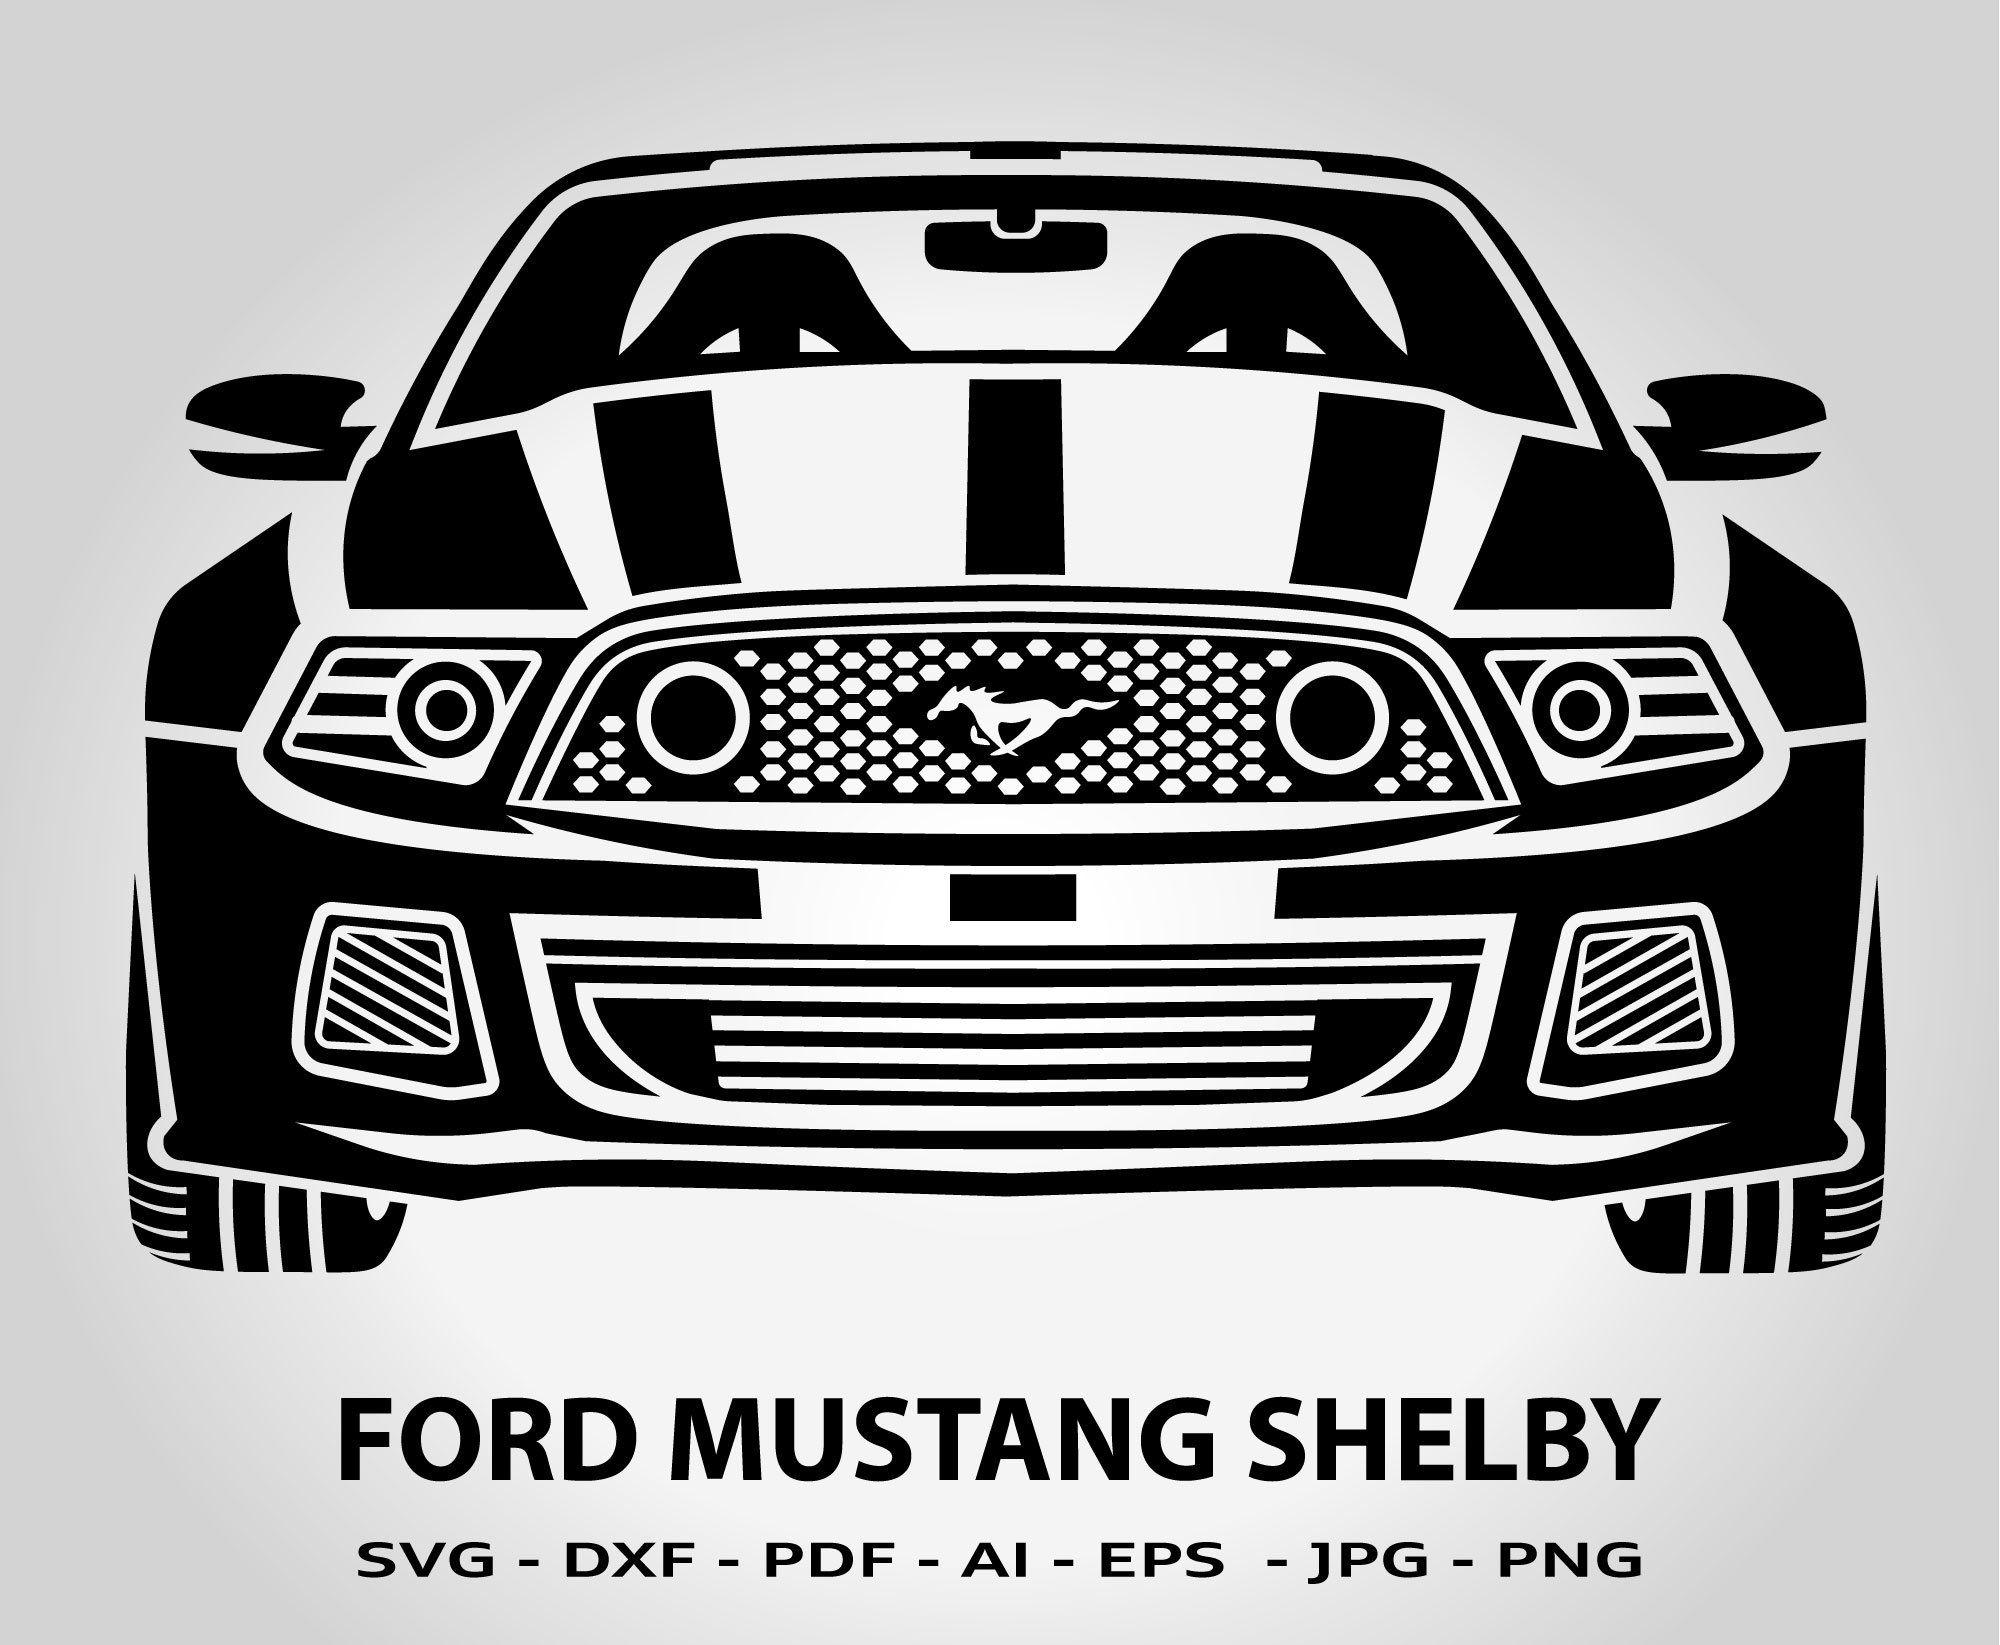 1967 Ford Mustang Vector Art Car Clip Art Com Classic Cars Ford Mustang Mustang